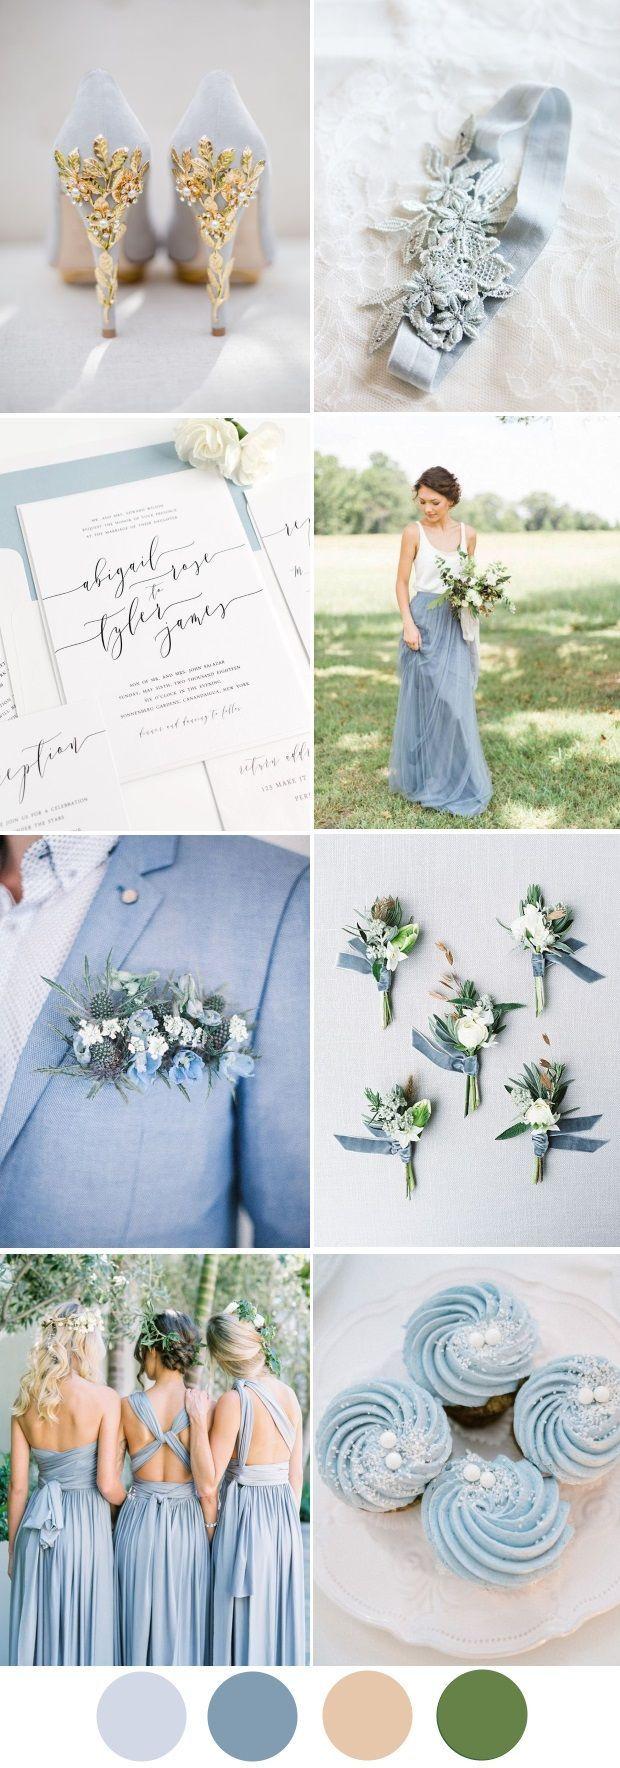 Wedding decorations yellow november 2018  best November   images on Pinterest  Wedding ideas